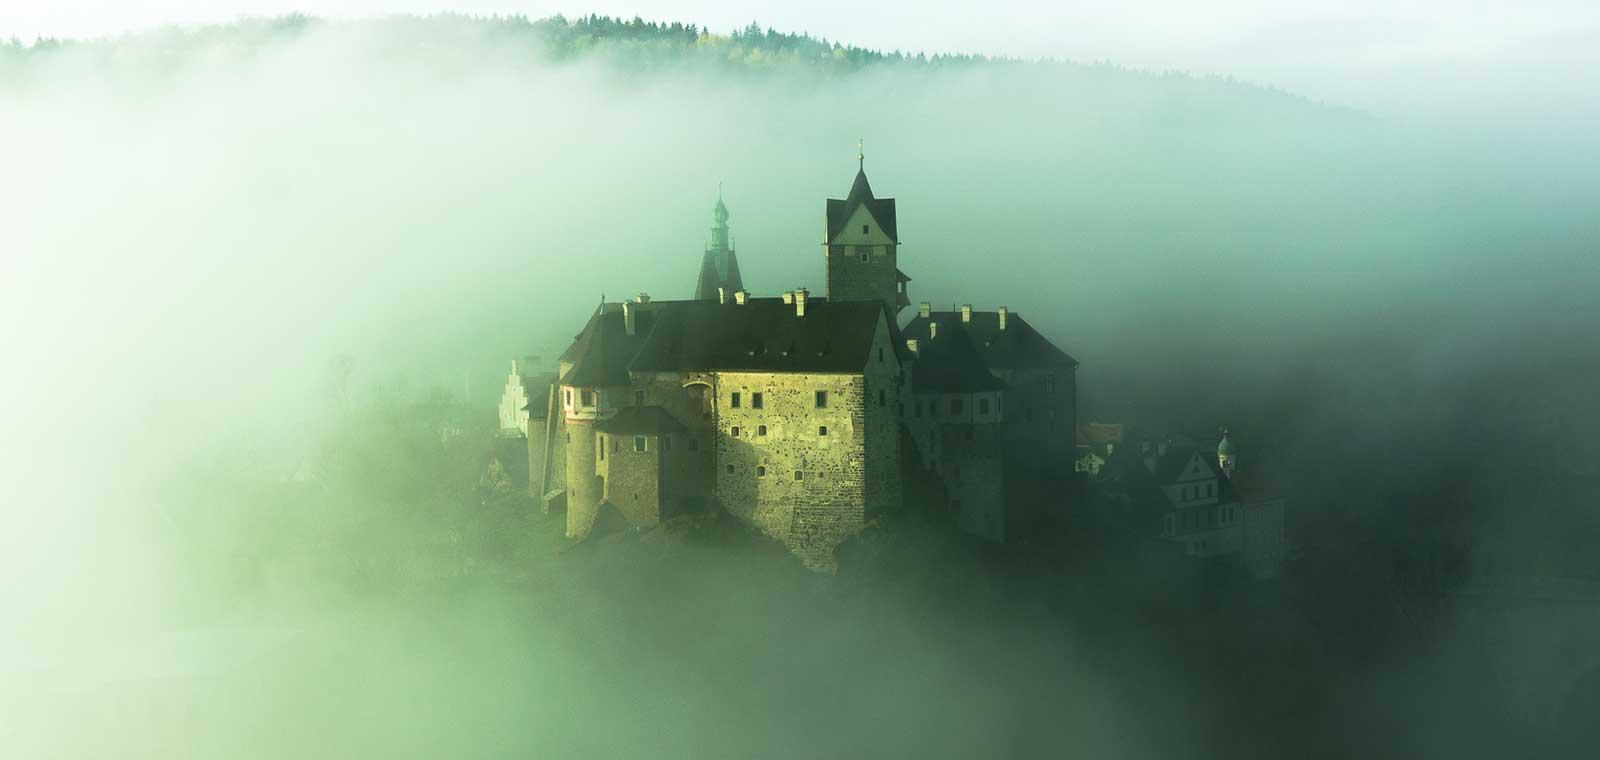 hrad-loket-uvod-01.jpg